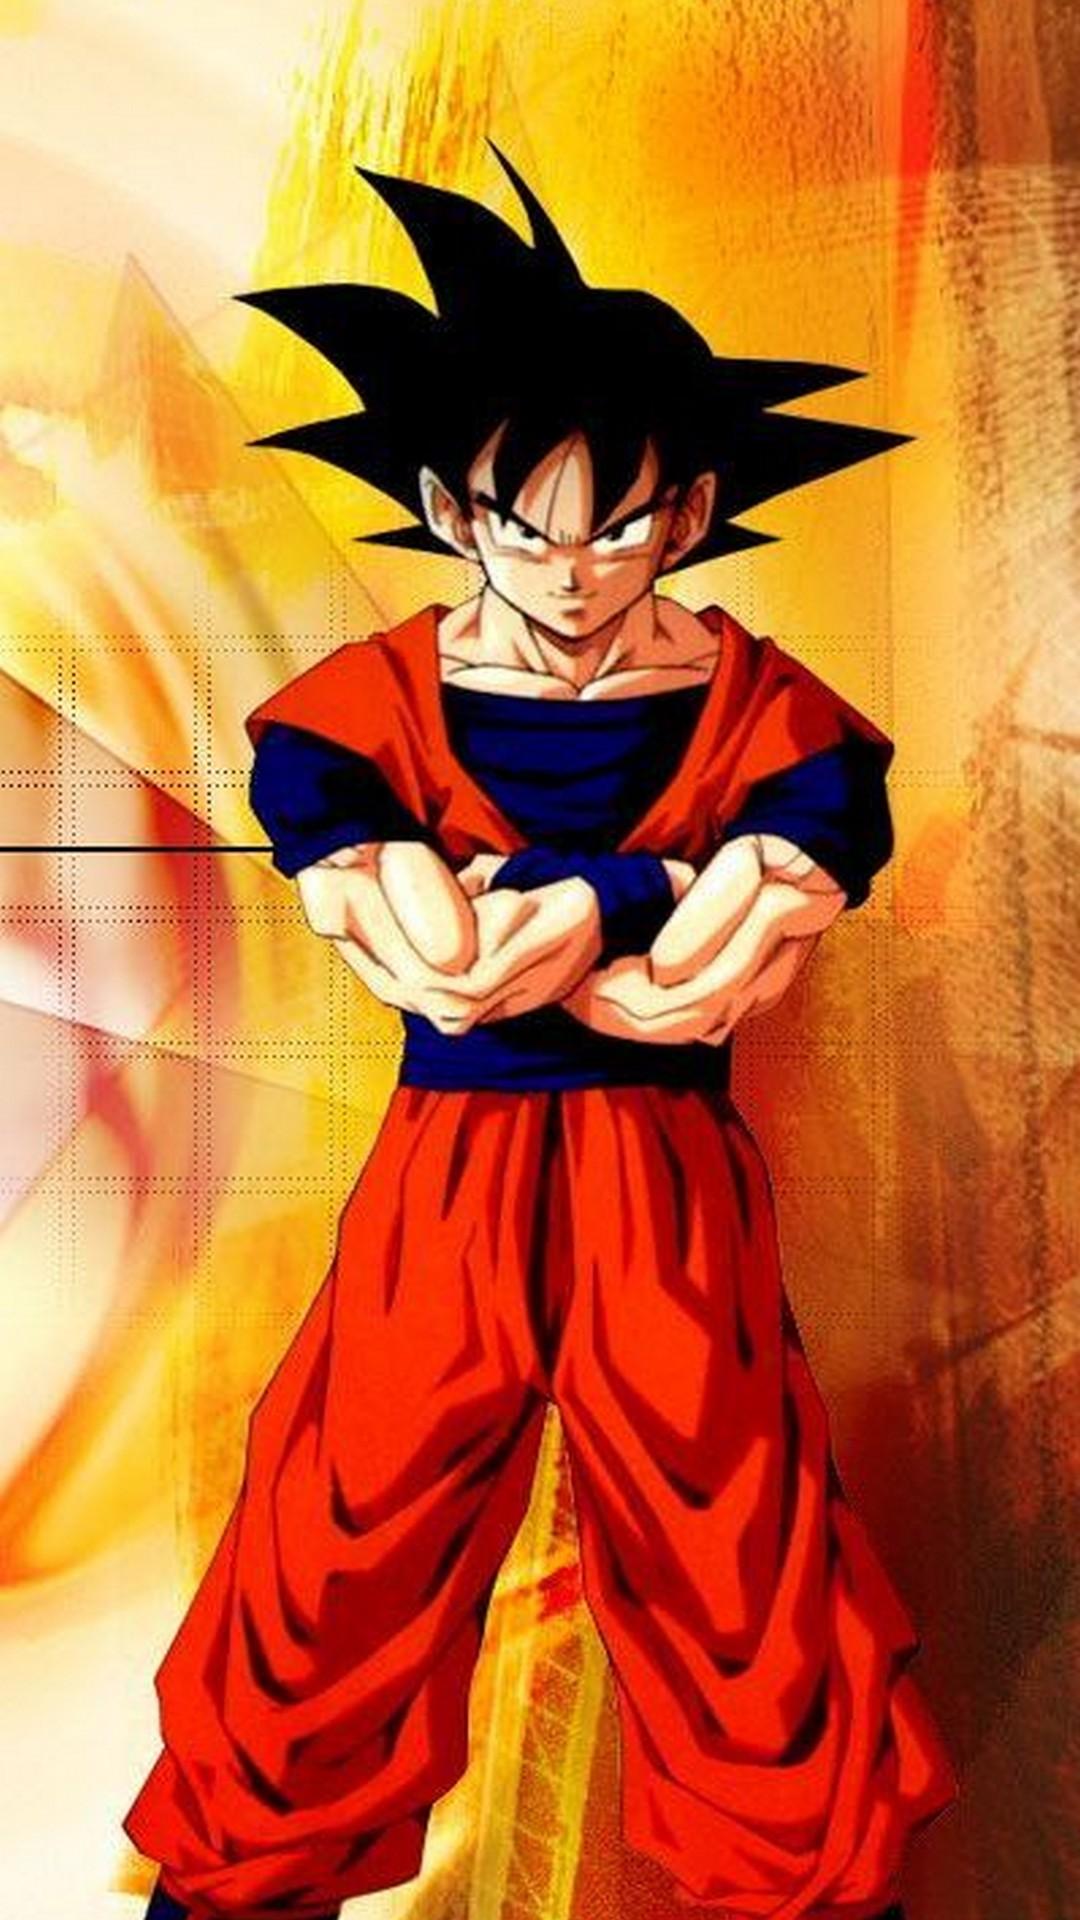 Goku Imagenes Hd Wallpapers For Android With Hd Resolution Goku Hd 1080x1920 Wallpaper Teahub Io